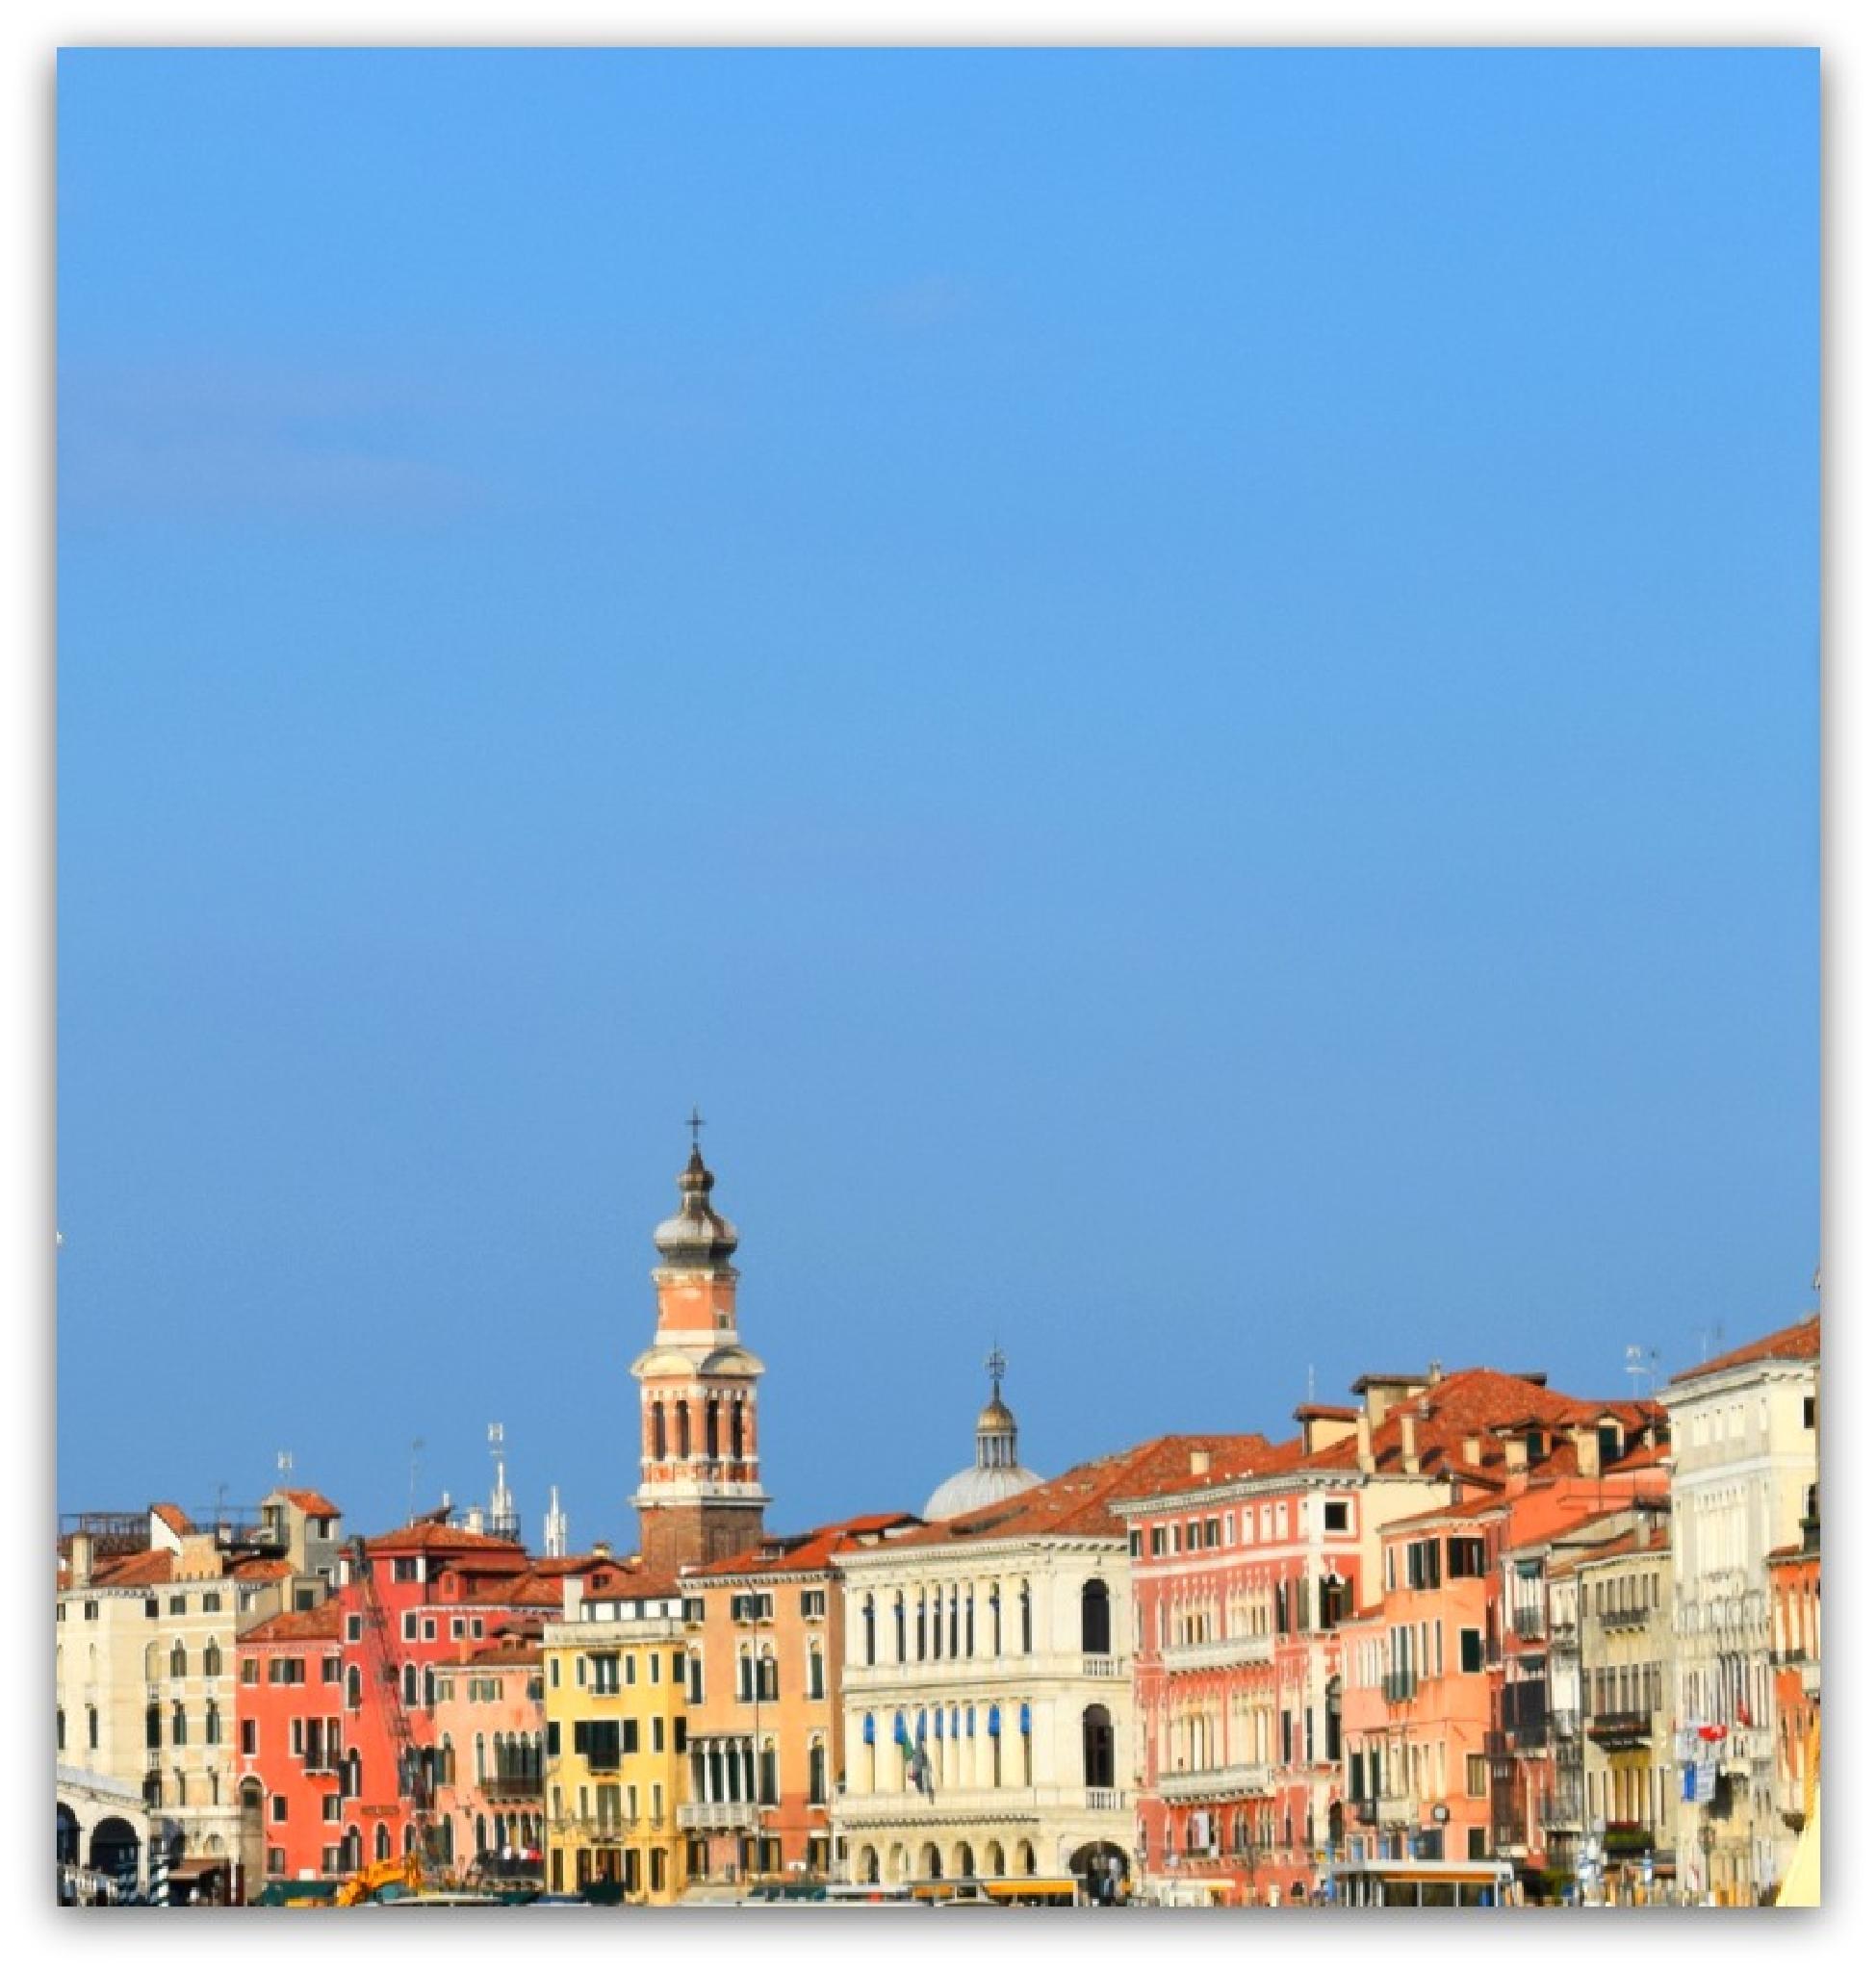 Colorful Venice by maria.telegdy